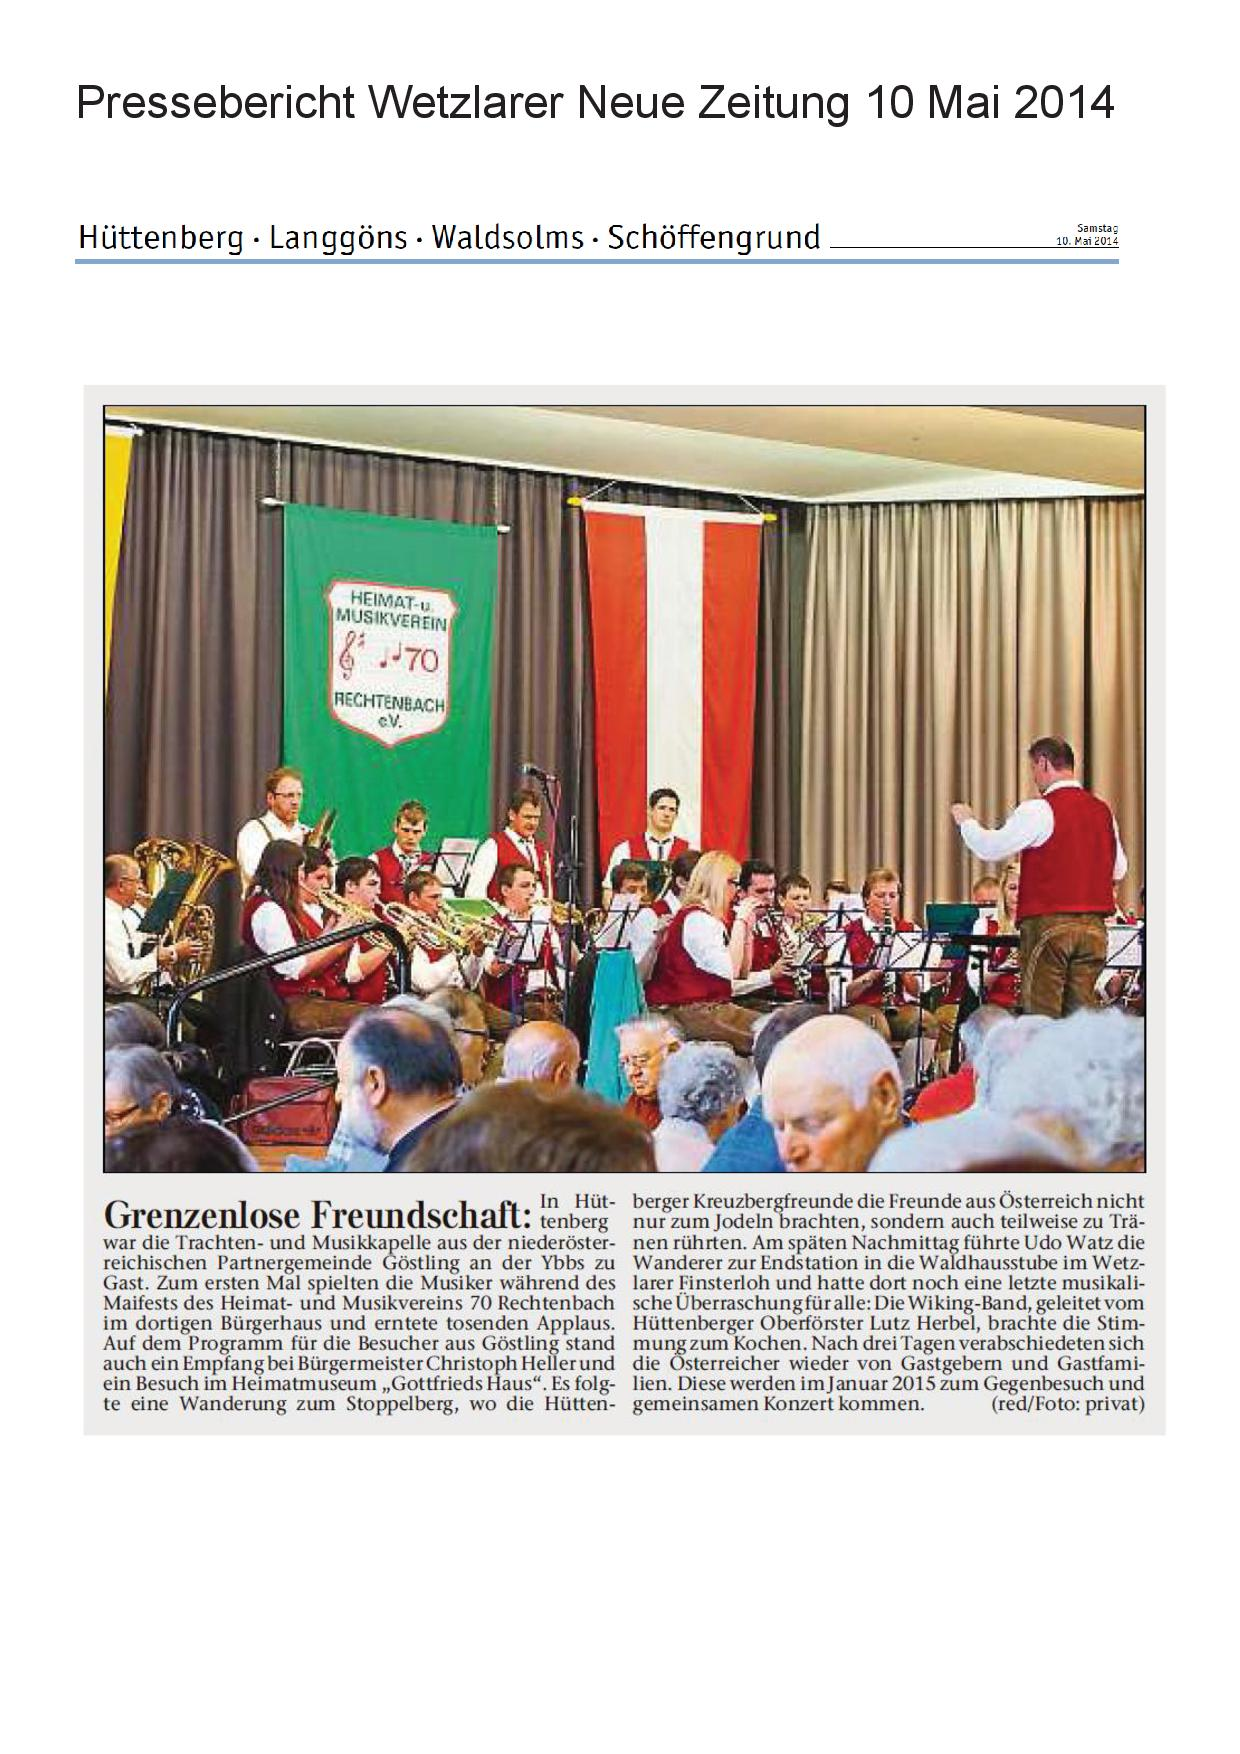 Pressebericht 01. Mai 2014